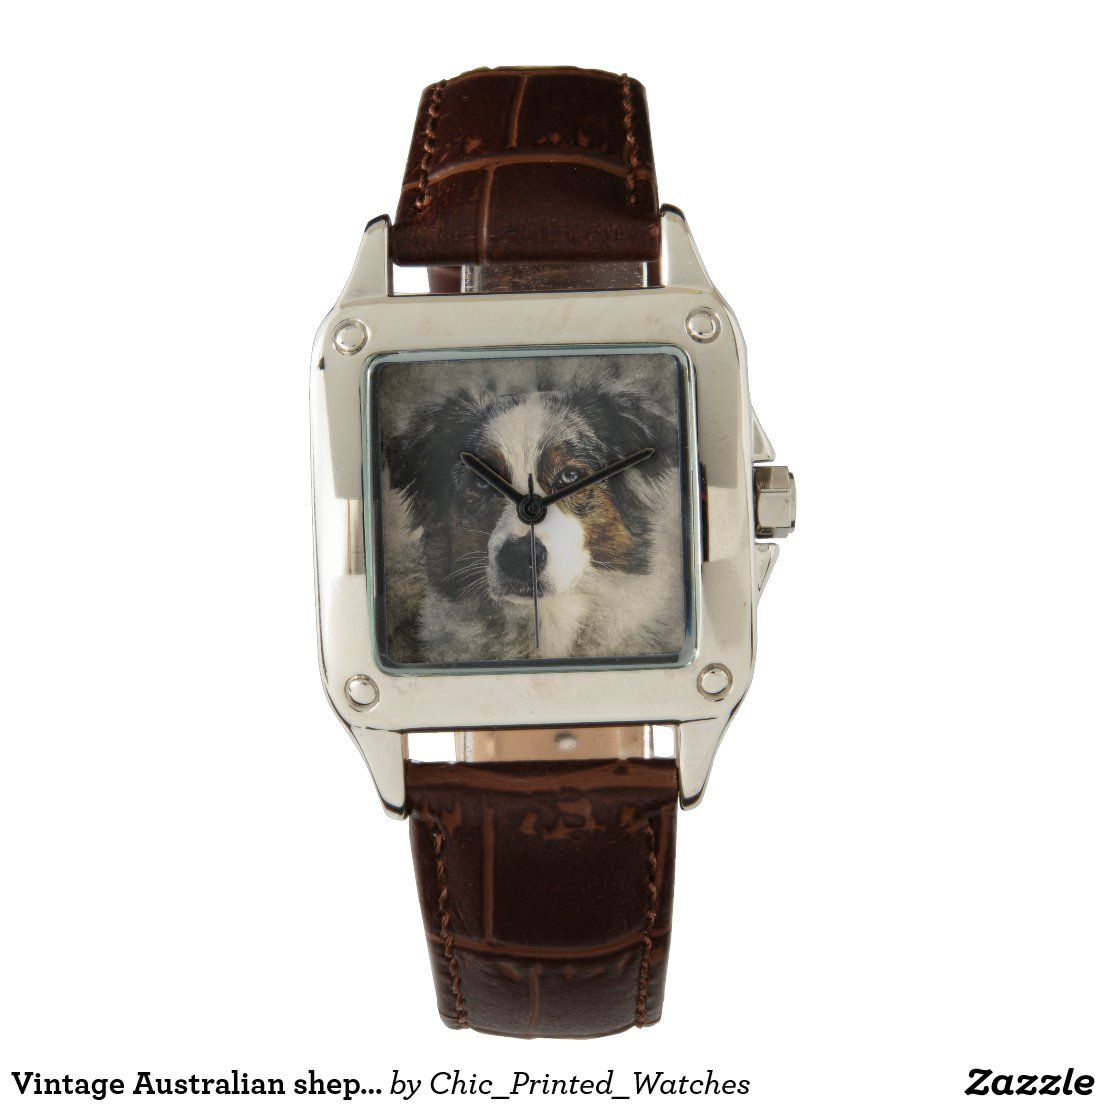 Vintage Australian Shepherd Dog Watch Zazzle Com Australian Shepherd Dogs Australian Shepherd Vintage